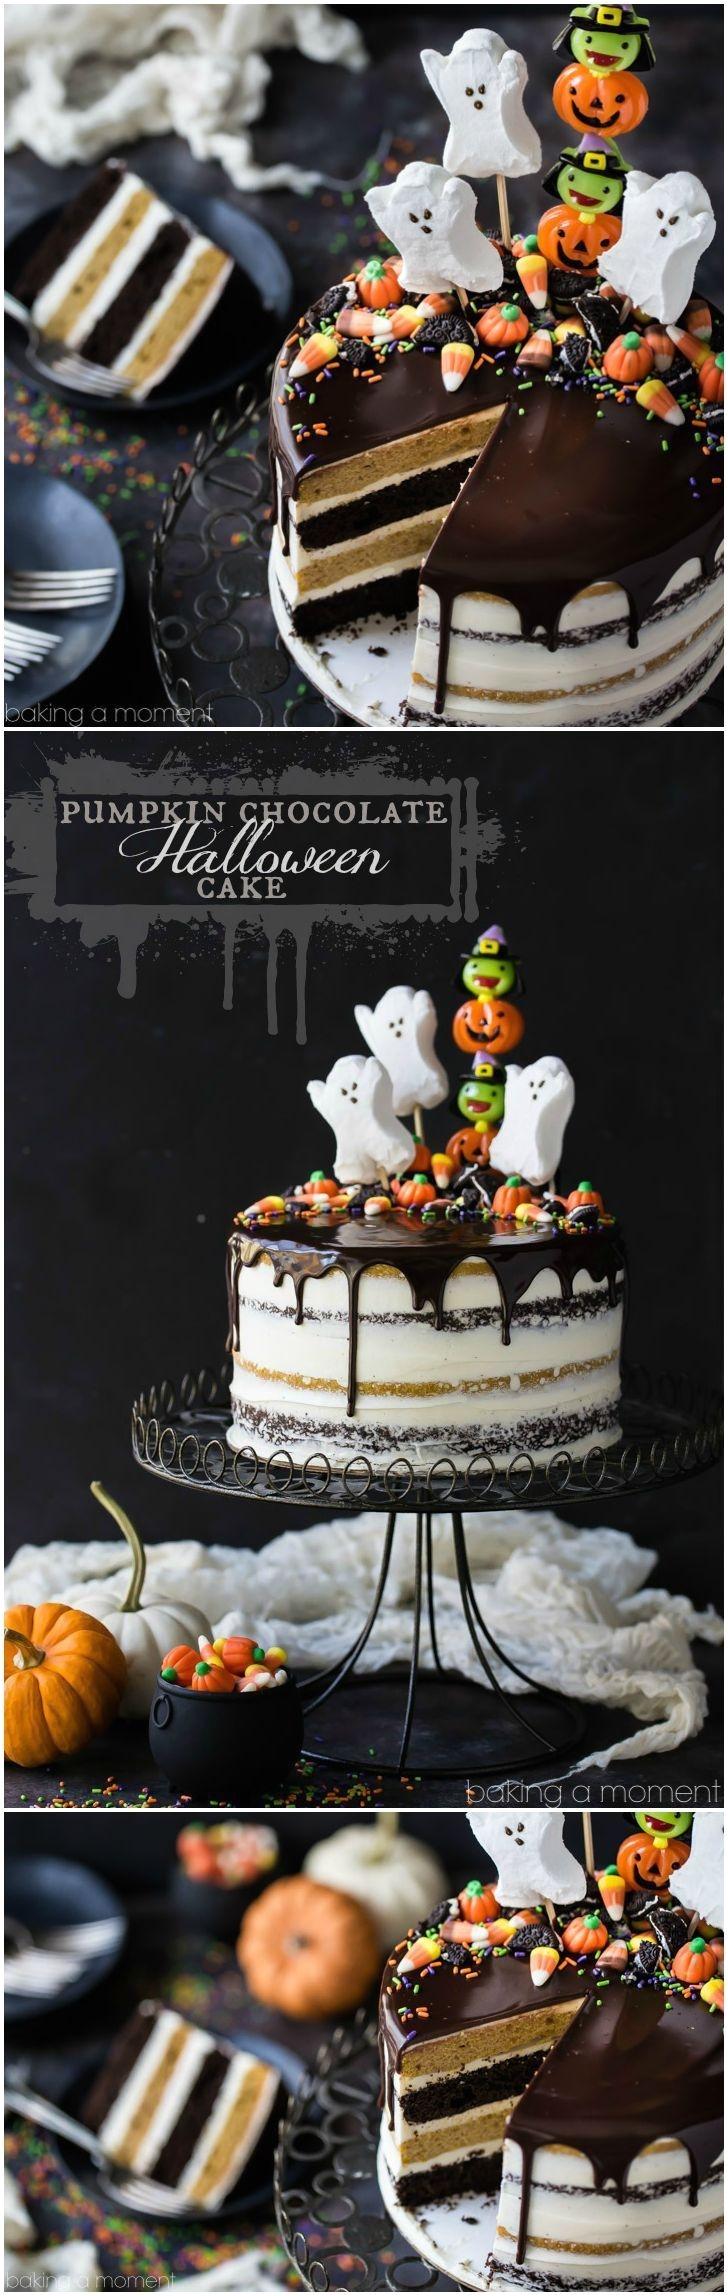 halloween cake decorations target 1828 best halloween images on pinterest halloween foods halloween